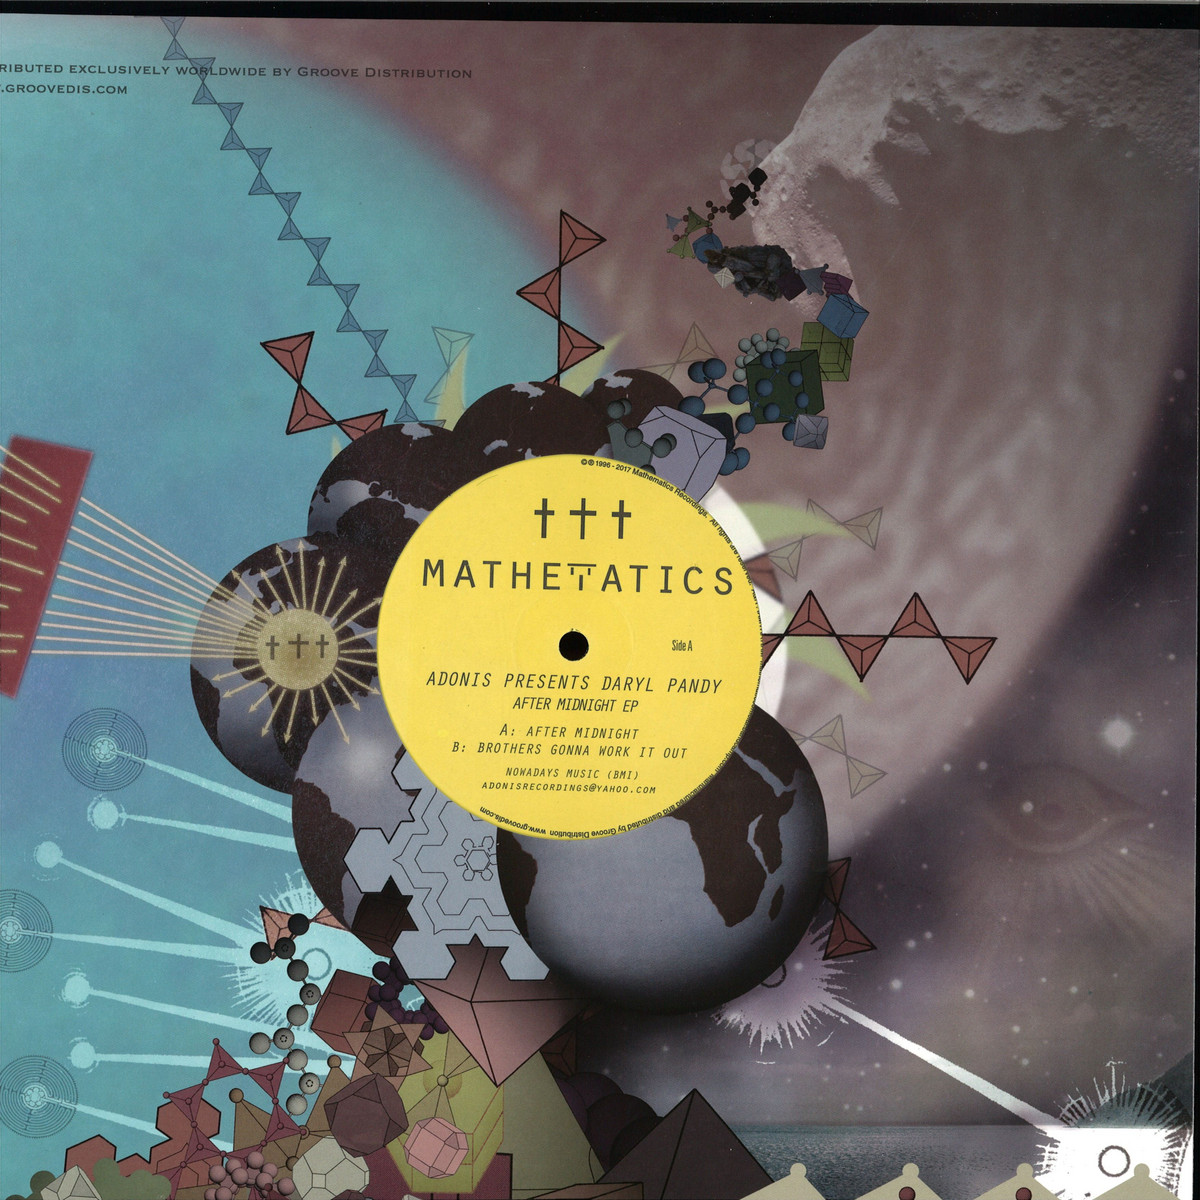 Adonis & Daryl Pandy - After Midnight (Mathematics)